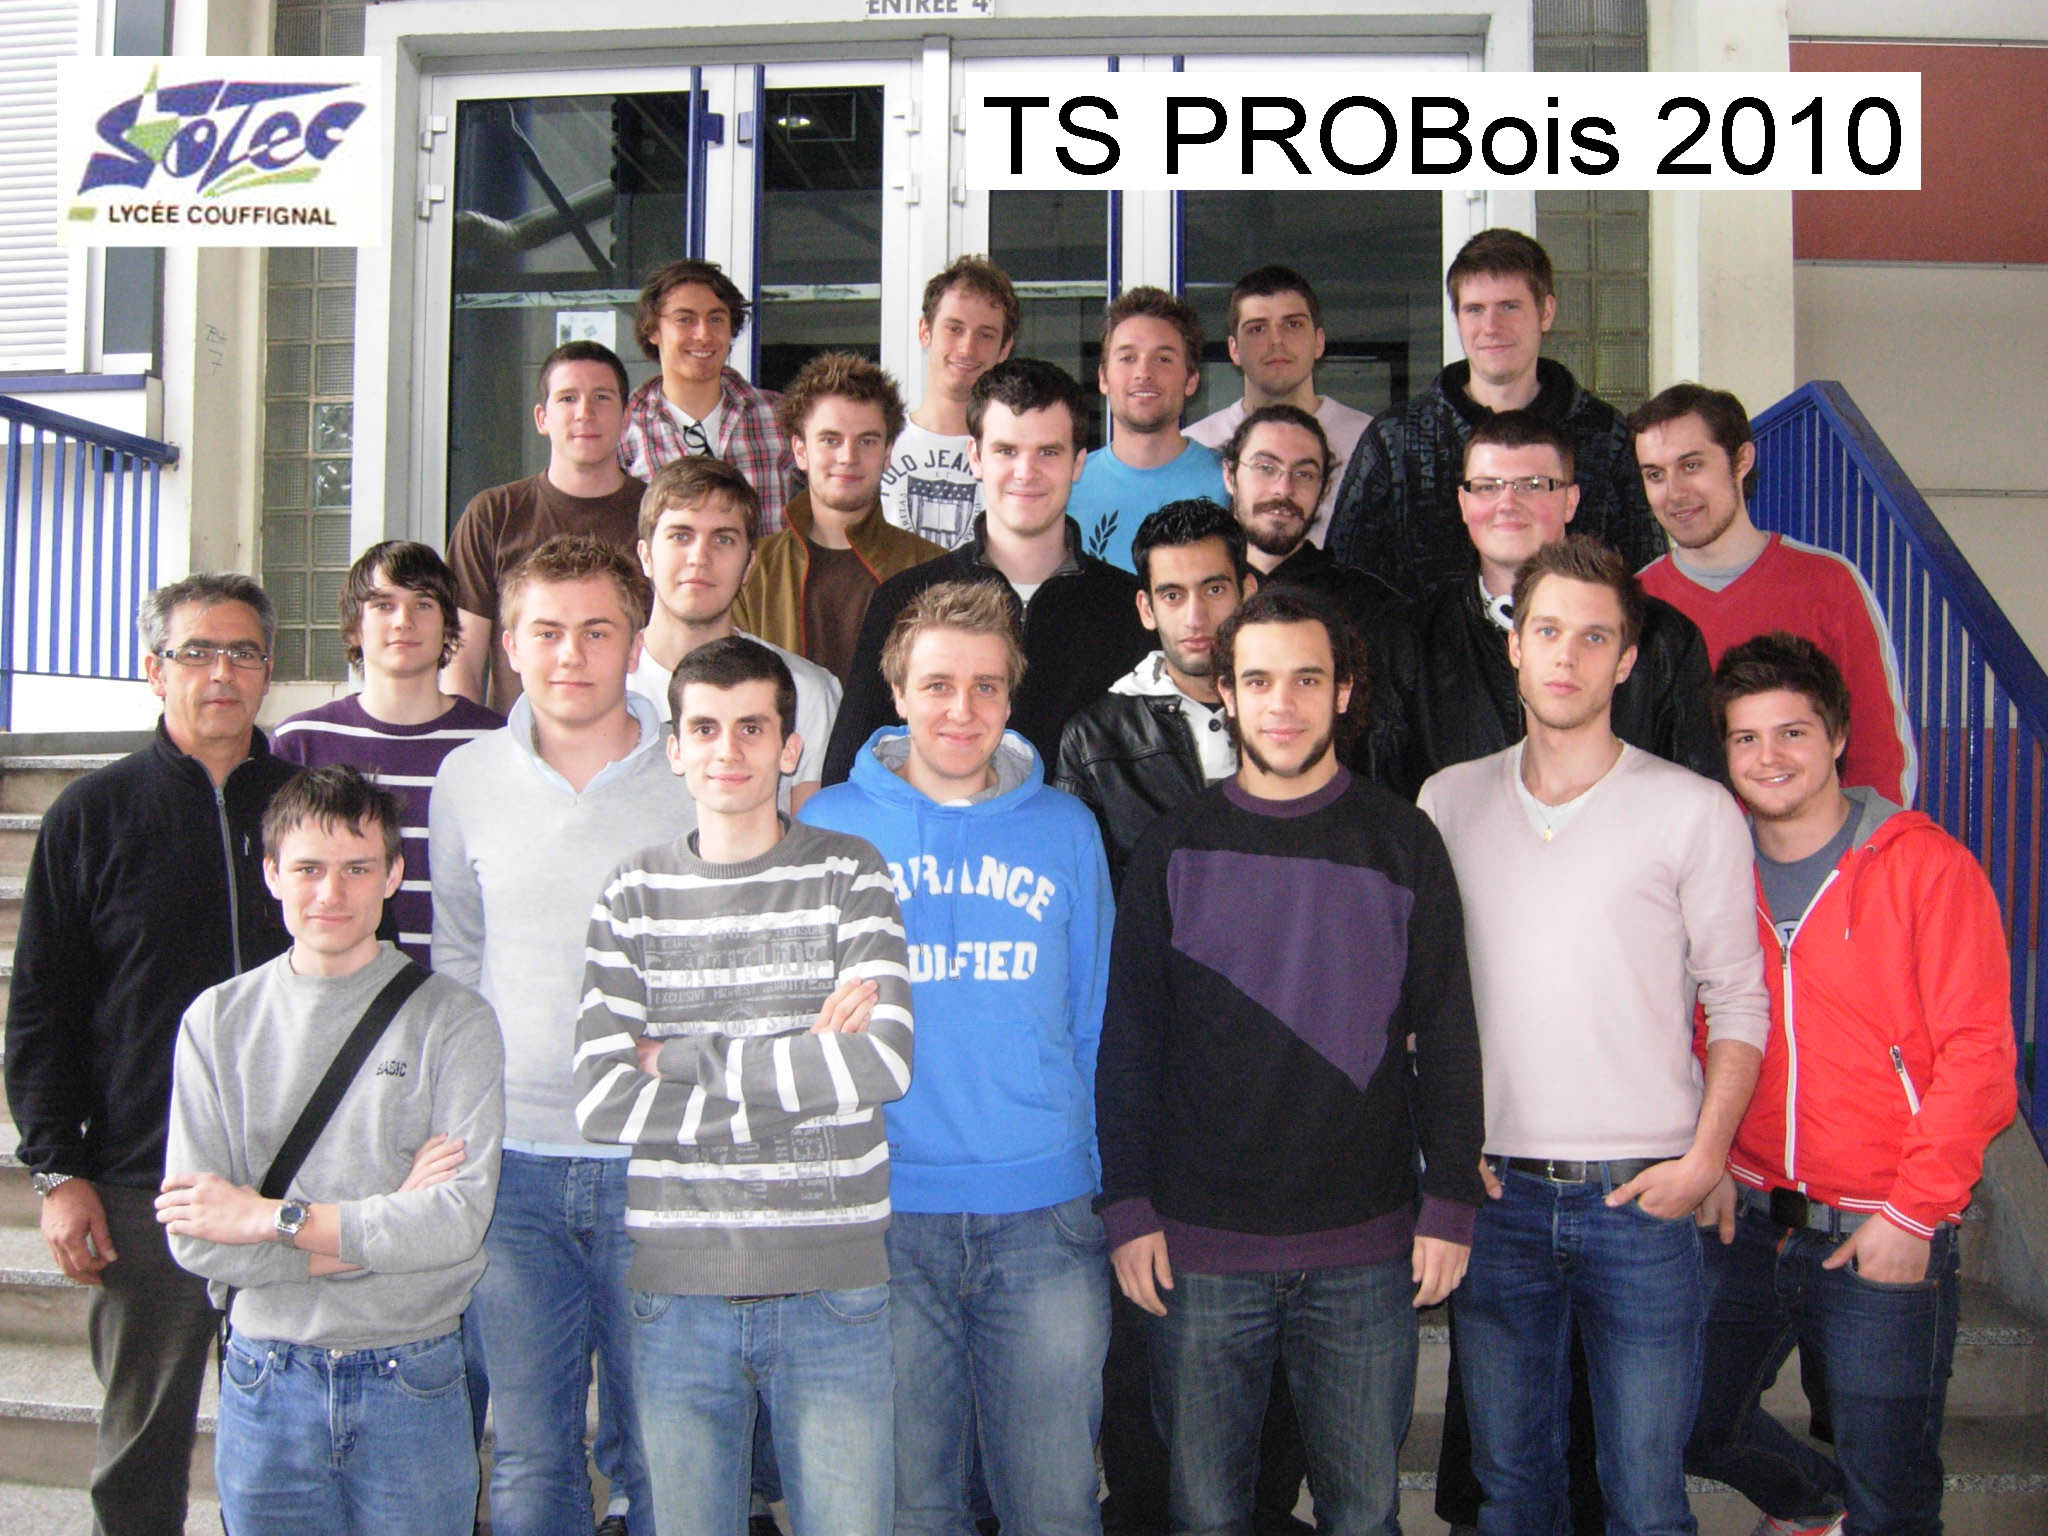 TS_PROBois.jpg